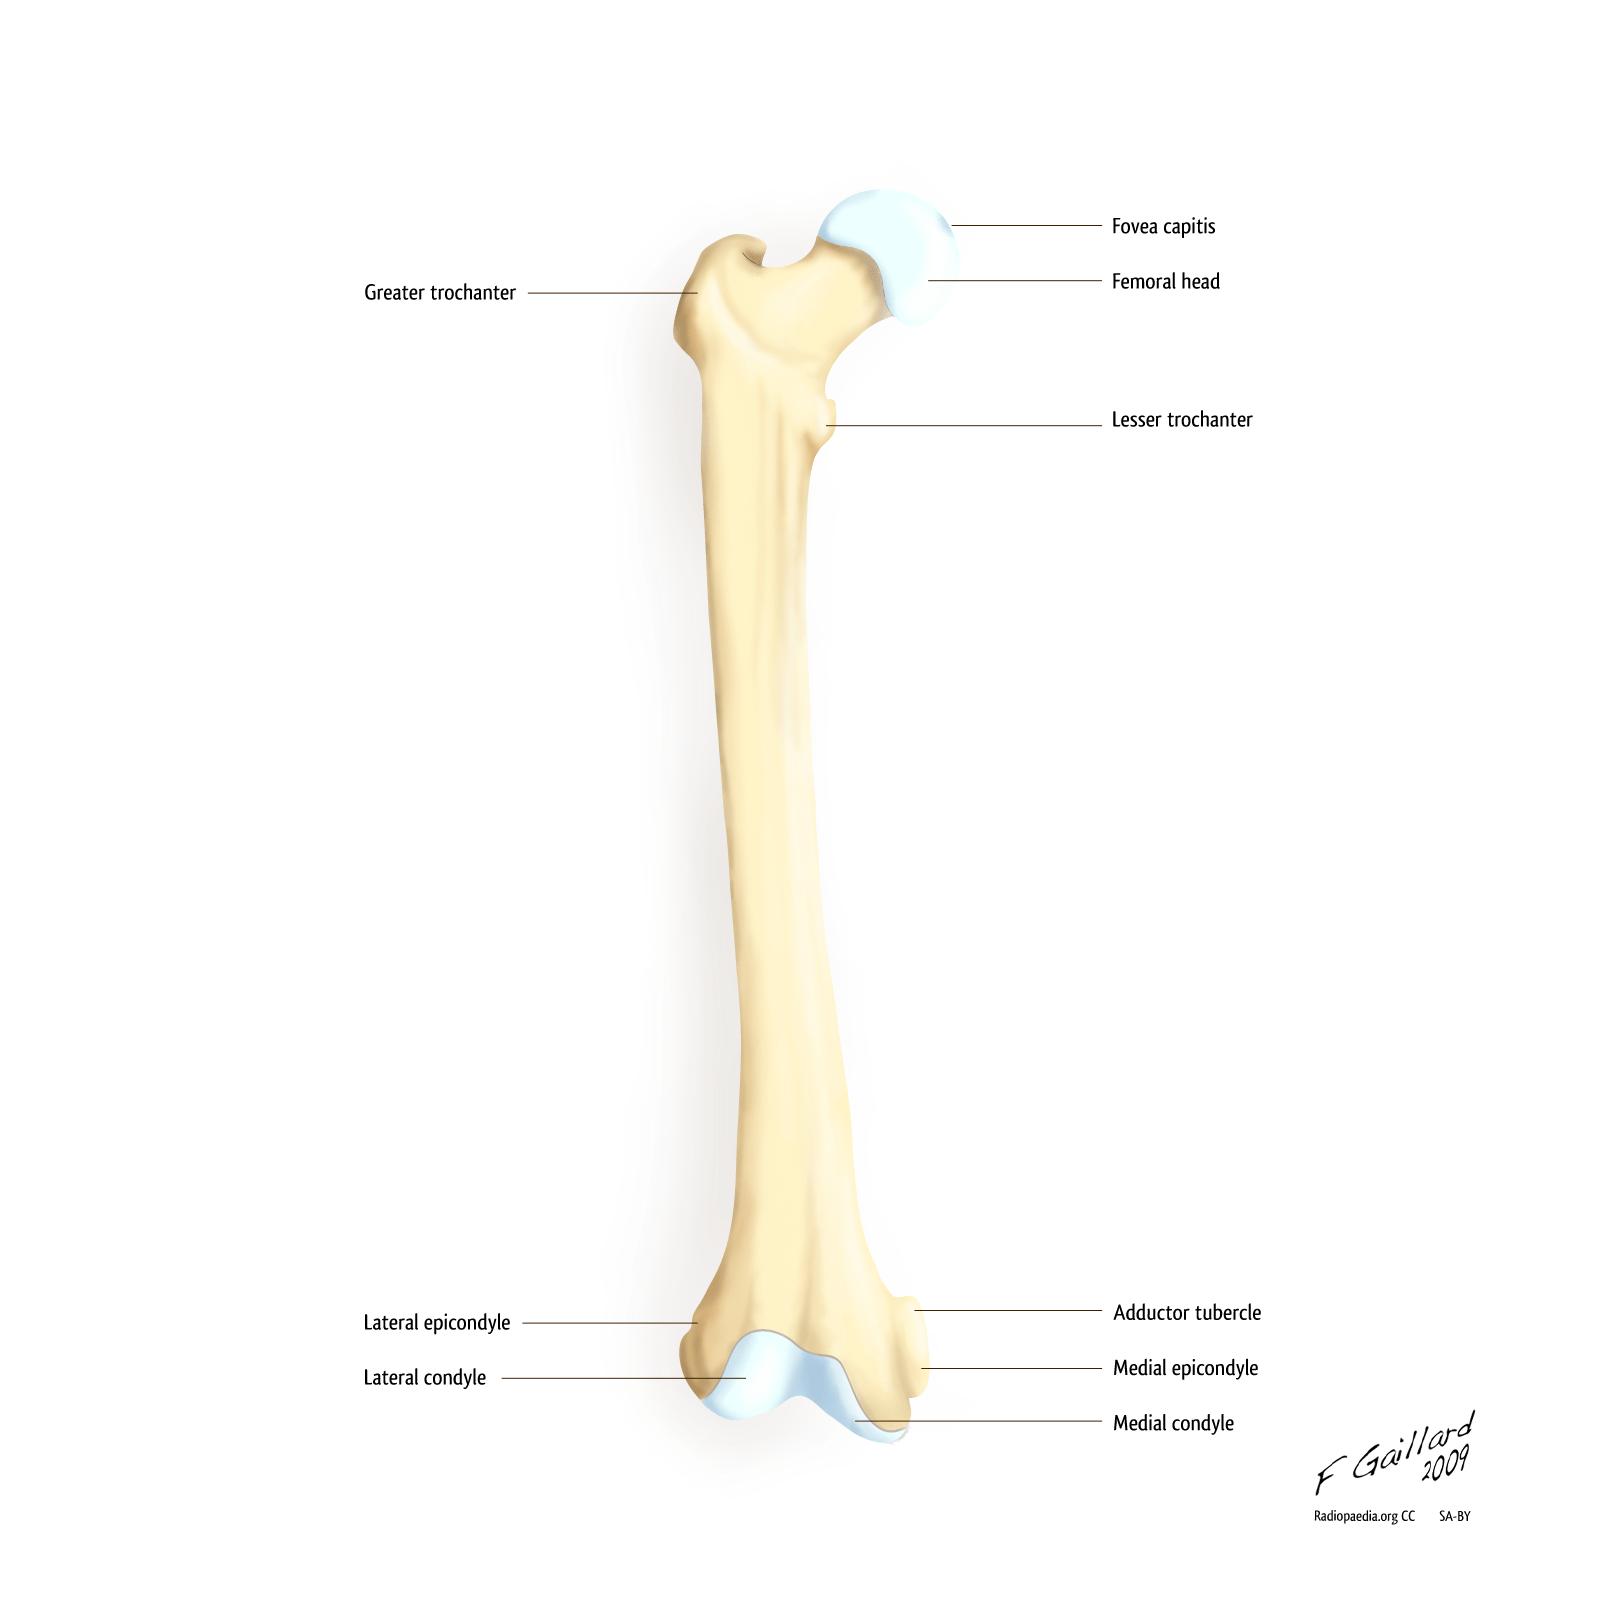 Gross Anatomy Of Commonly Fractured Bones